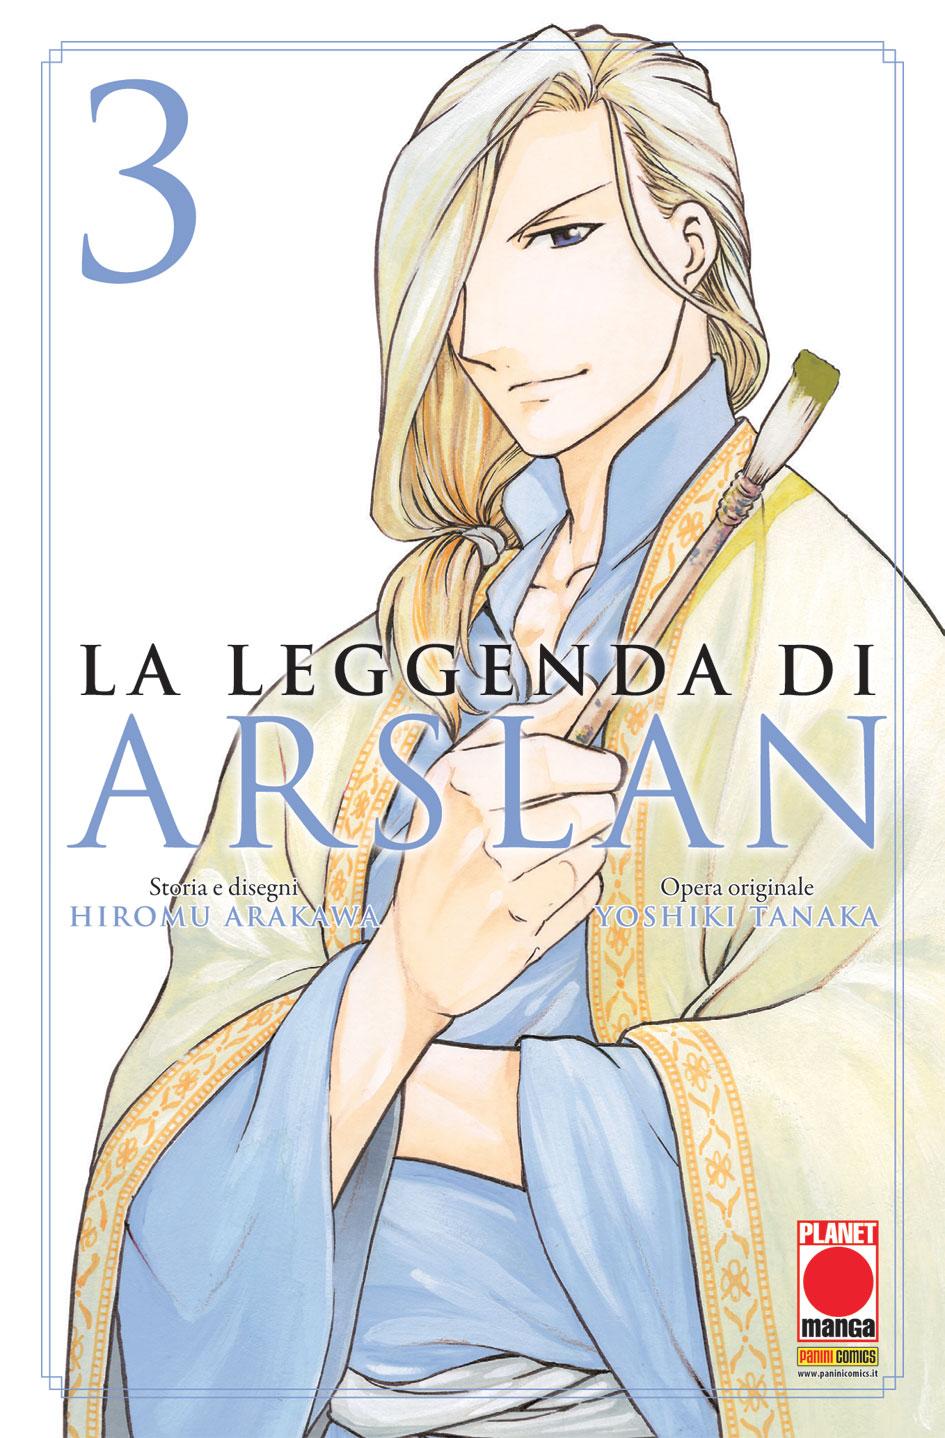 Più riguardo a La leggenda di Arslan vol. 3